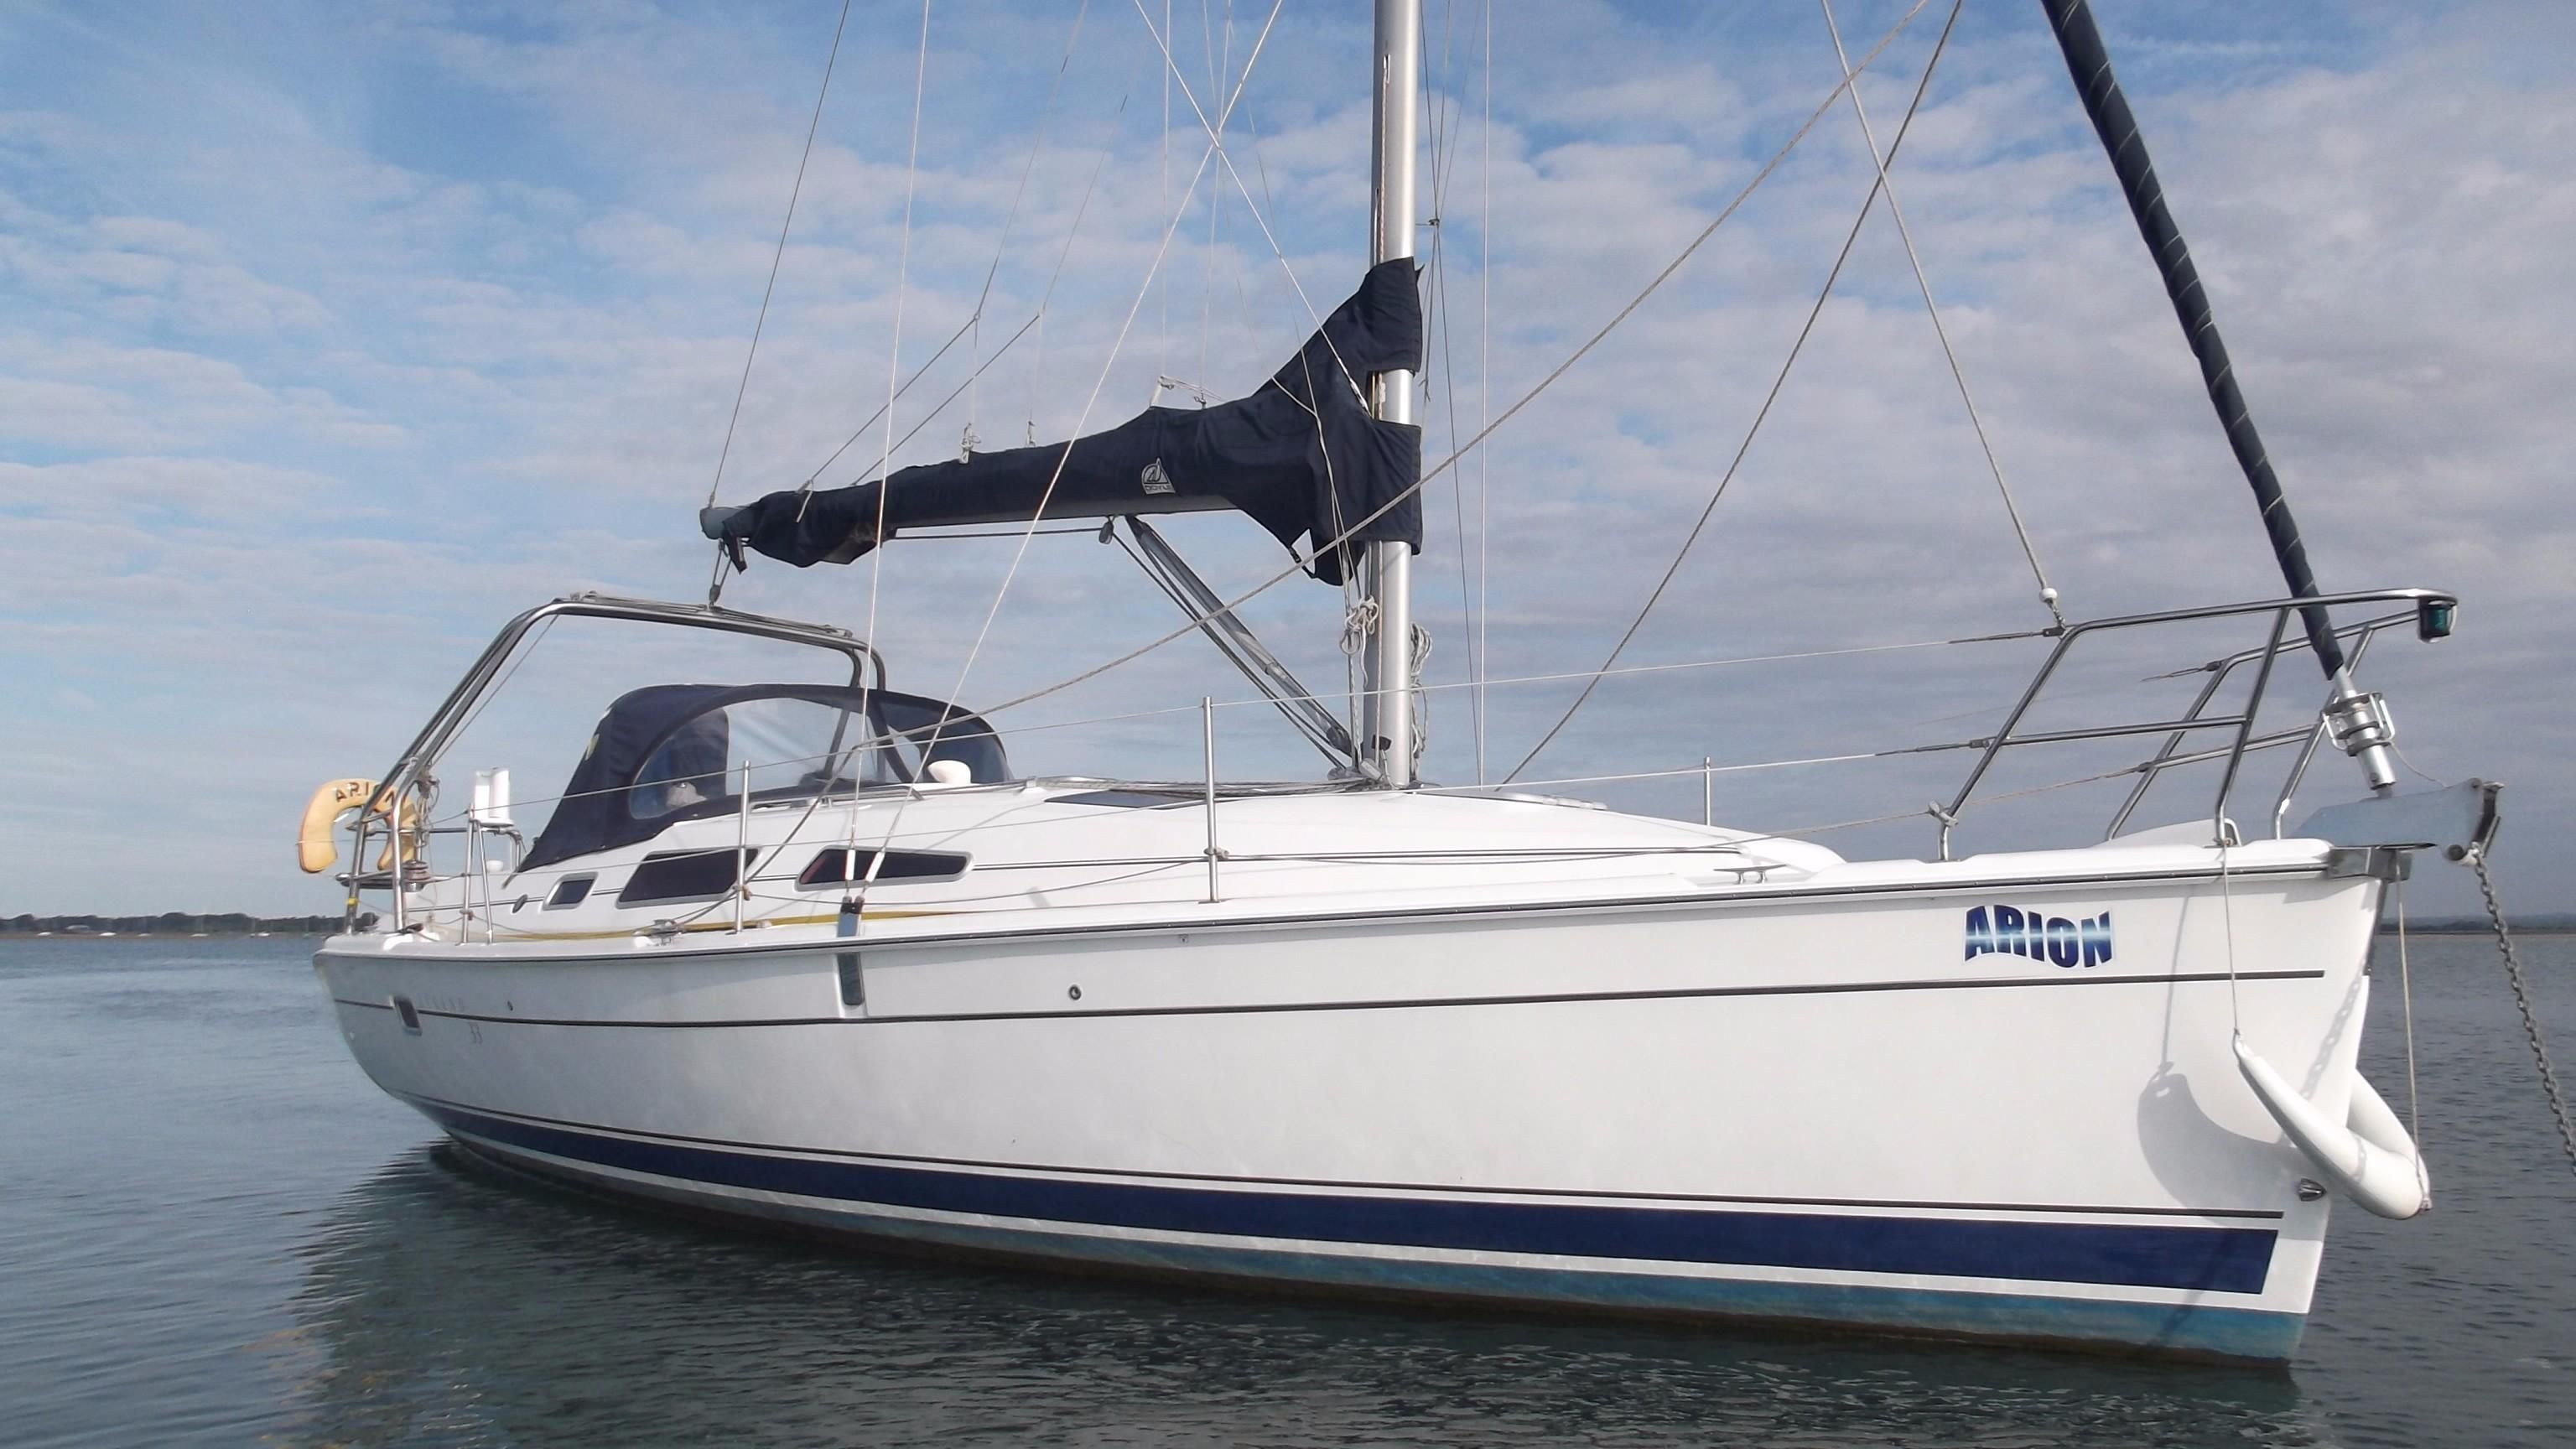 Hayling Island Marina Boats For Sale